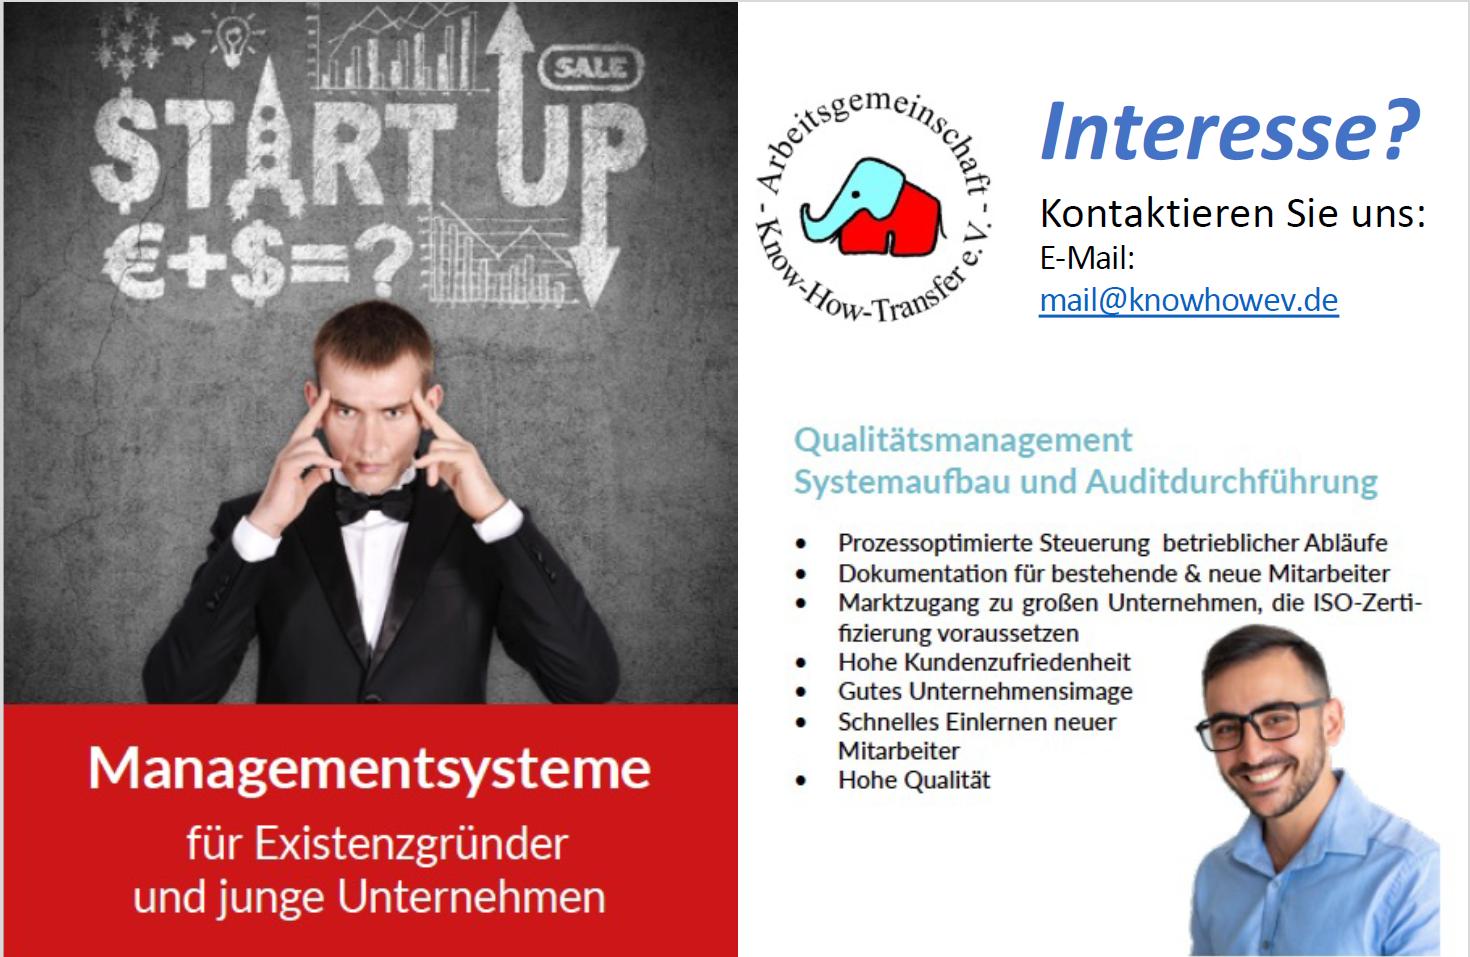 Tagesseminar Qualitätsmanagement – Arbeitsgemeinschaft Know-How-Transfer e.V.